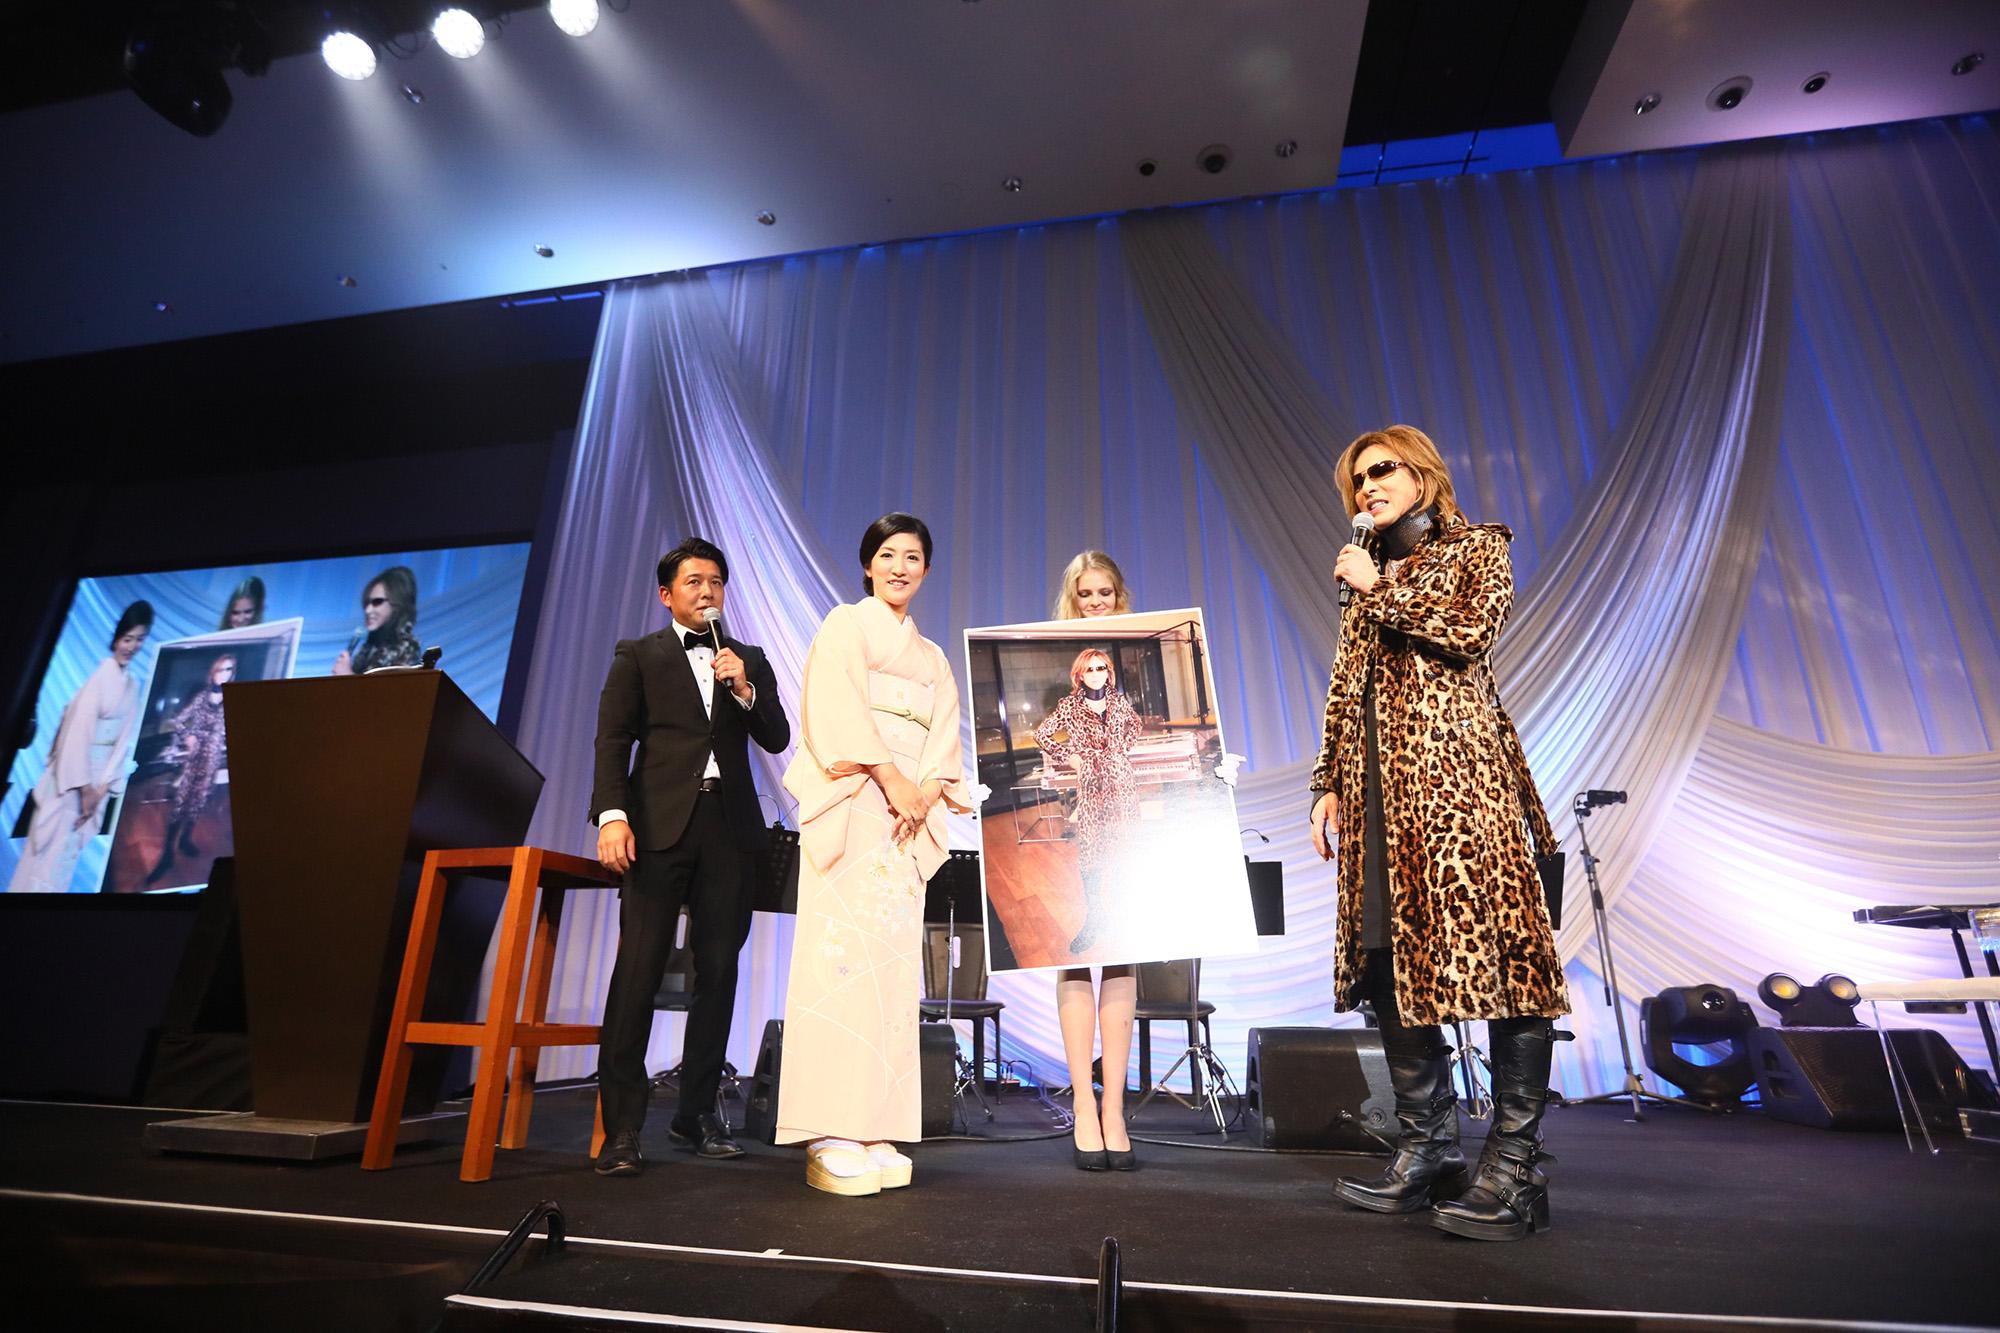 RMMS-Yoshiki-Dinner-Show-Tokyo-20170902-K0219